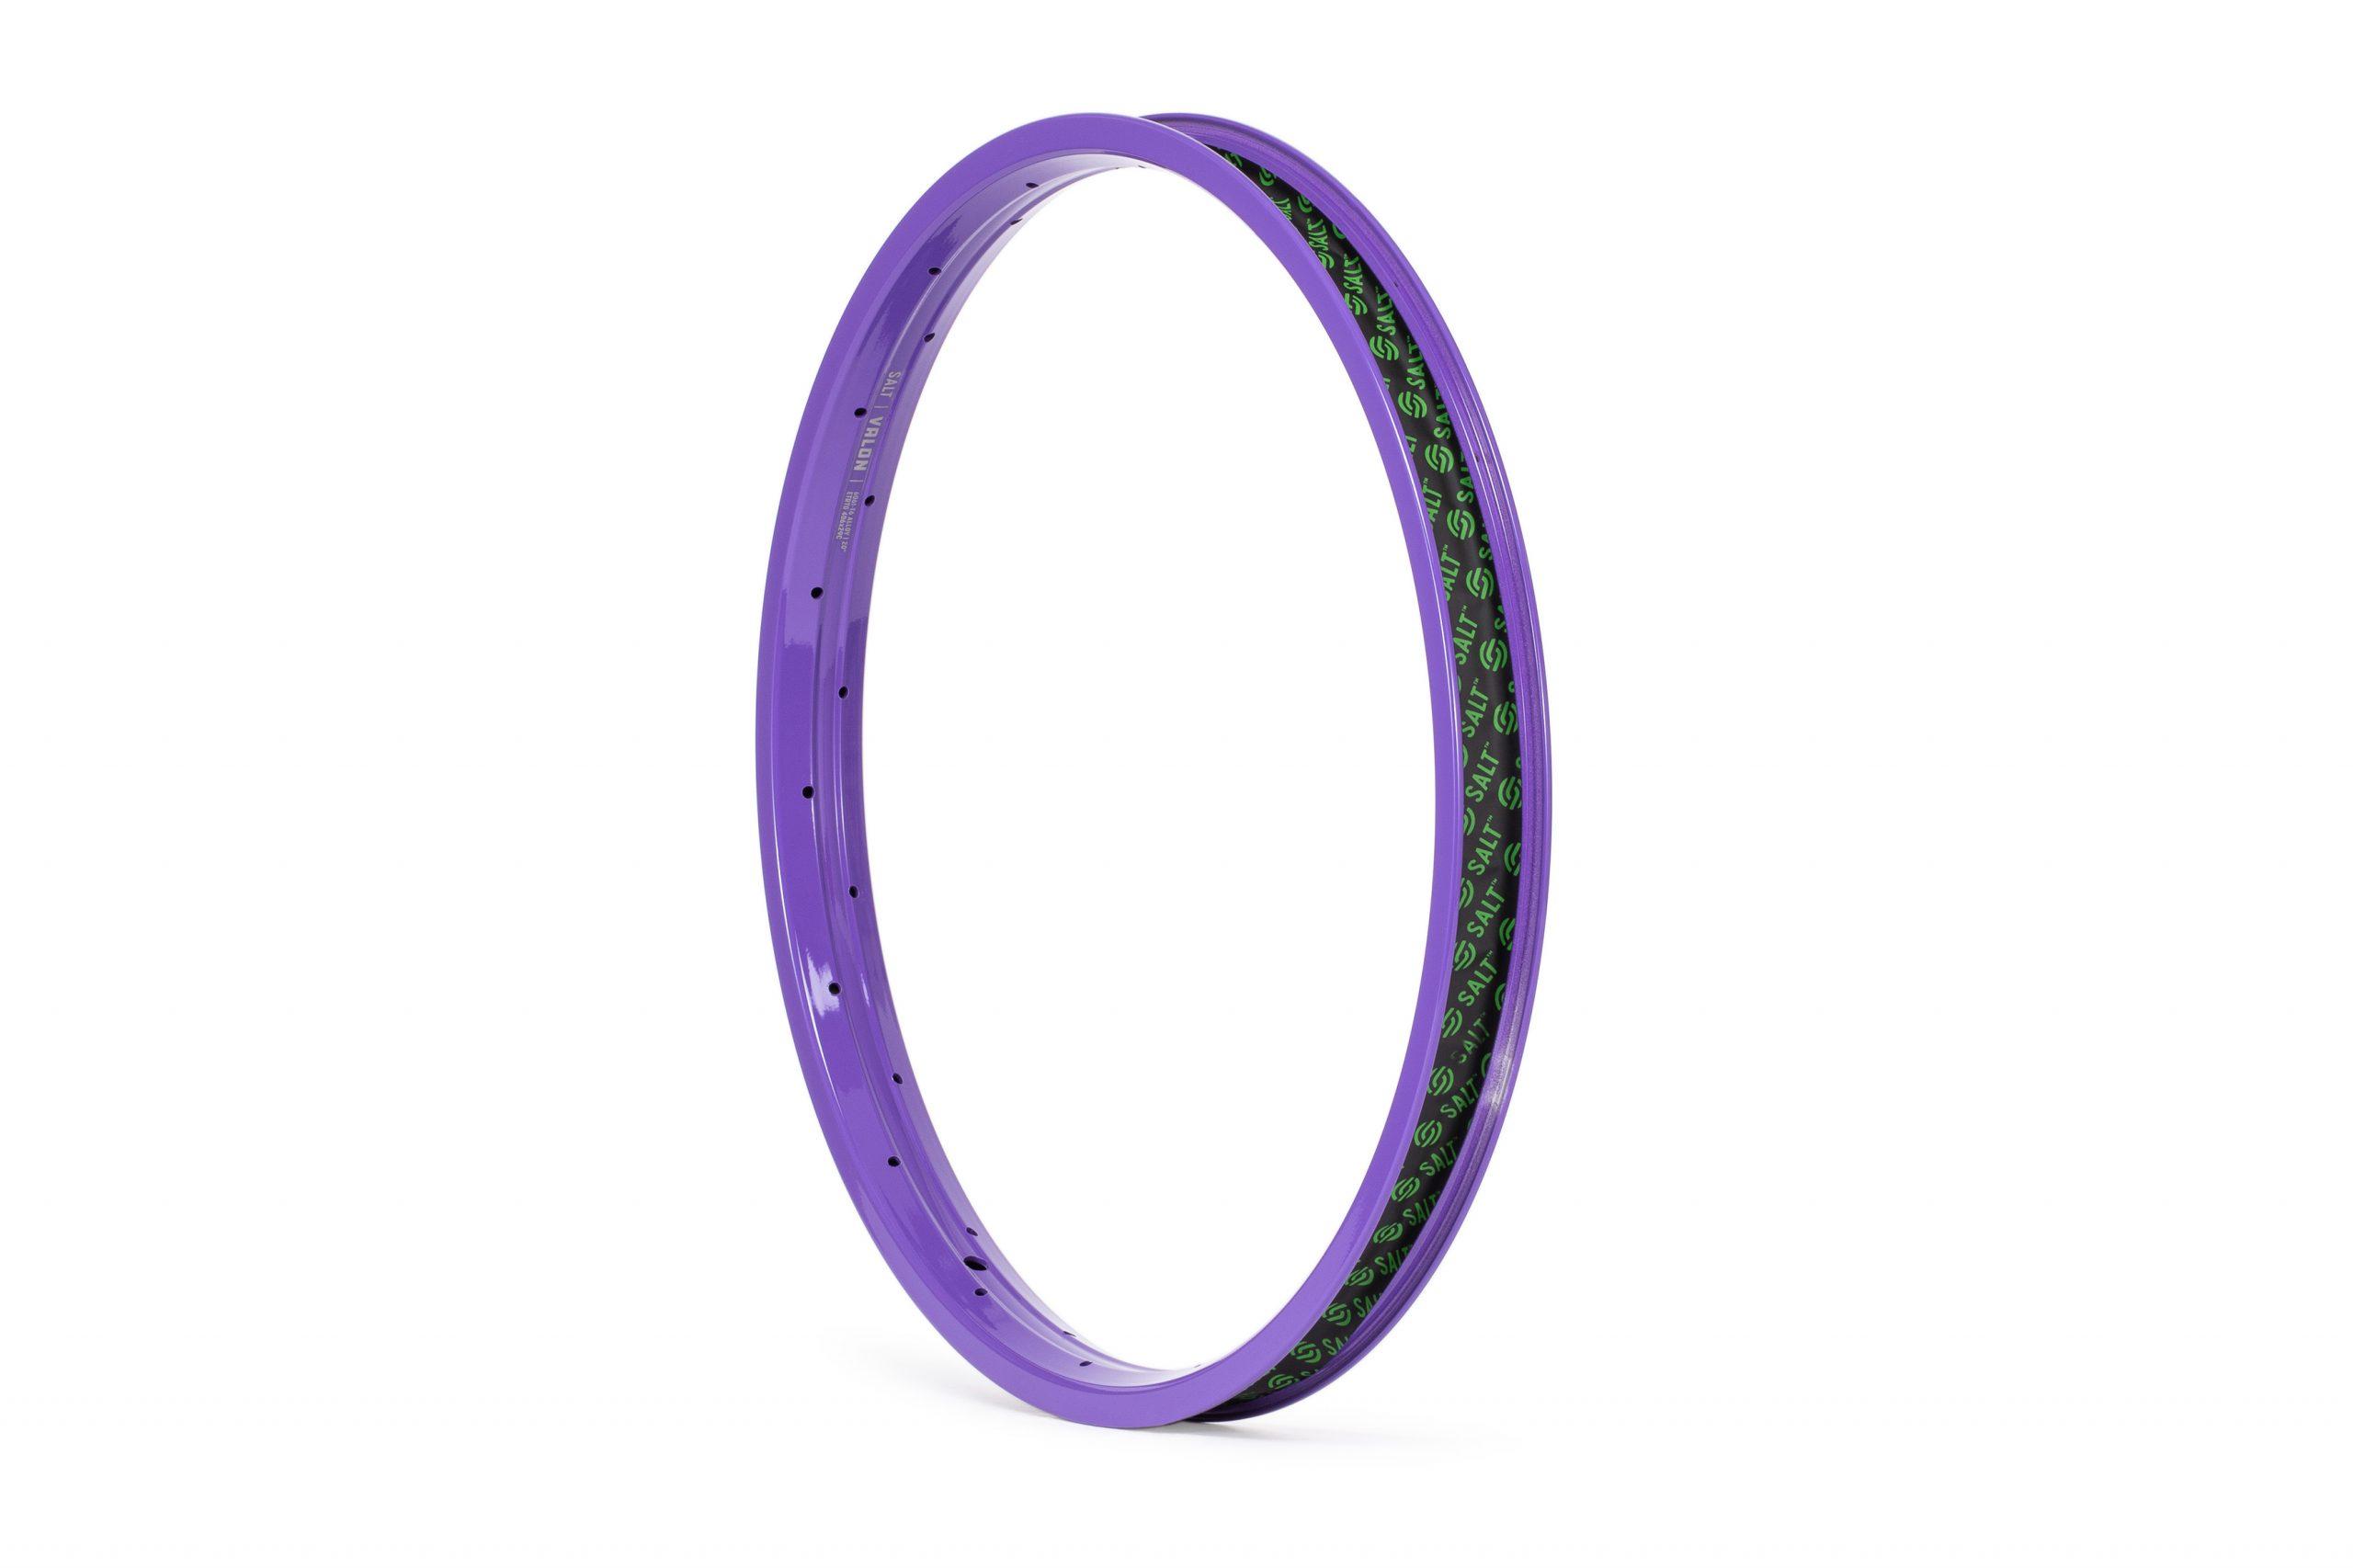 Salt_Valon_rim_purple-01